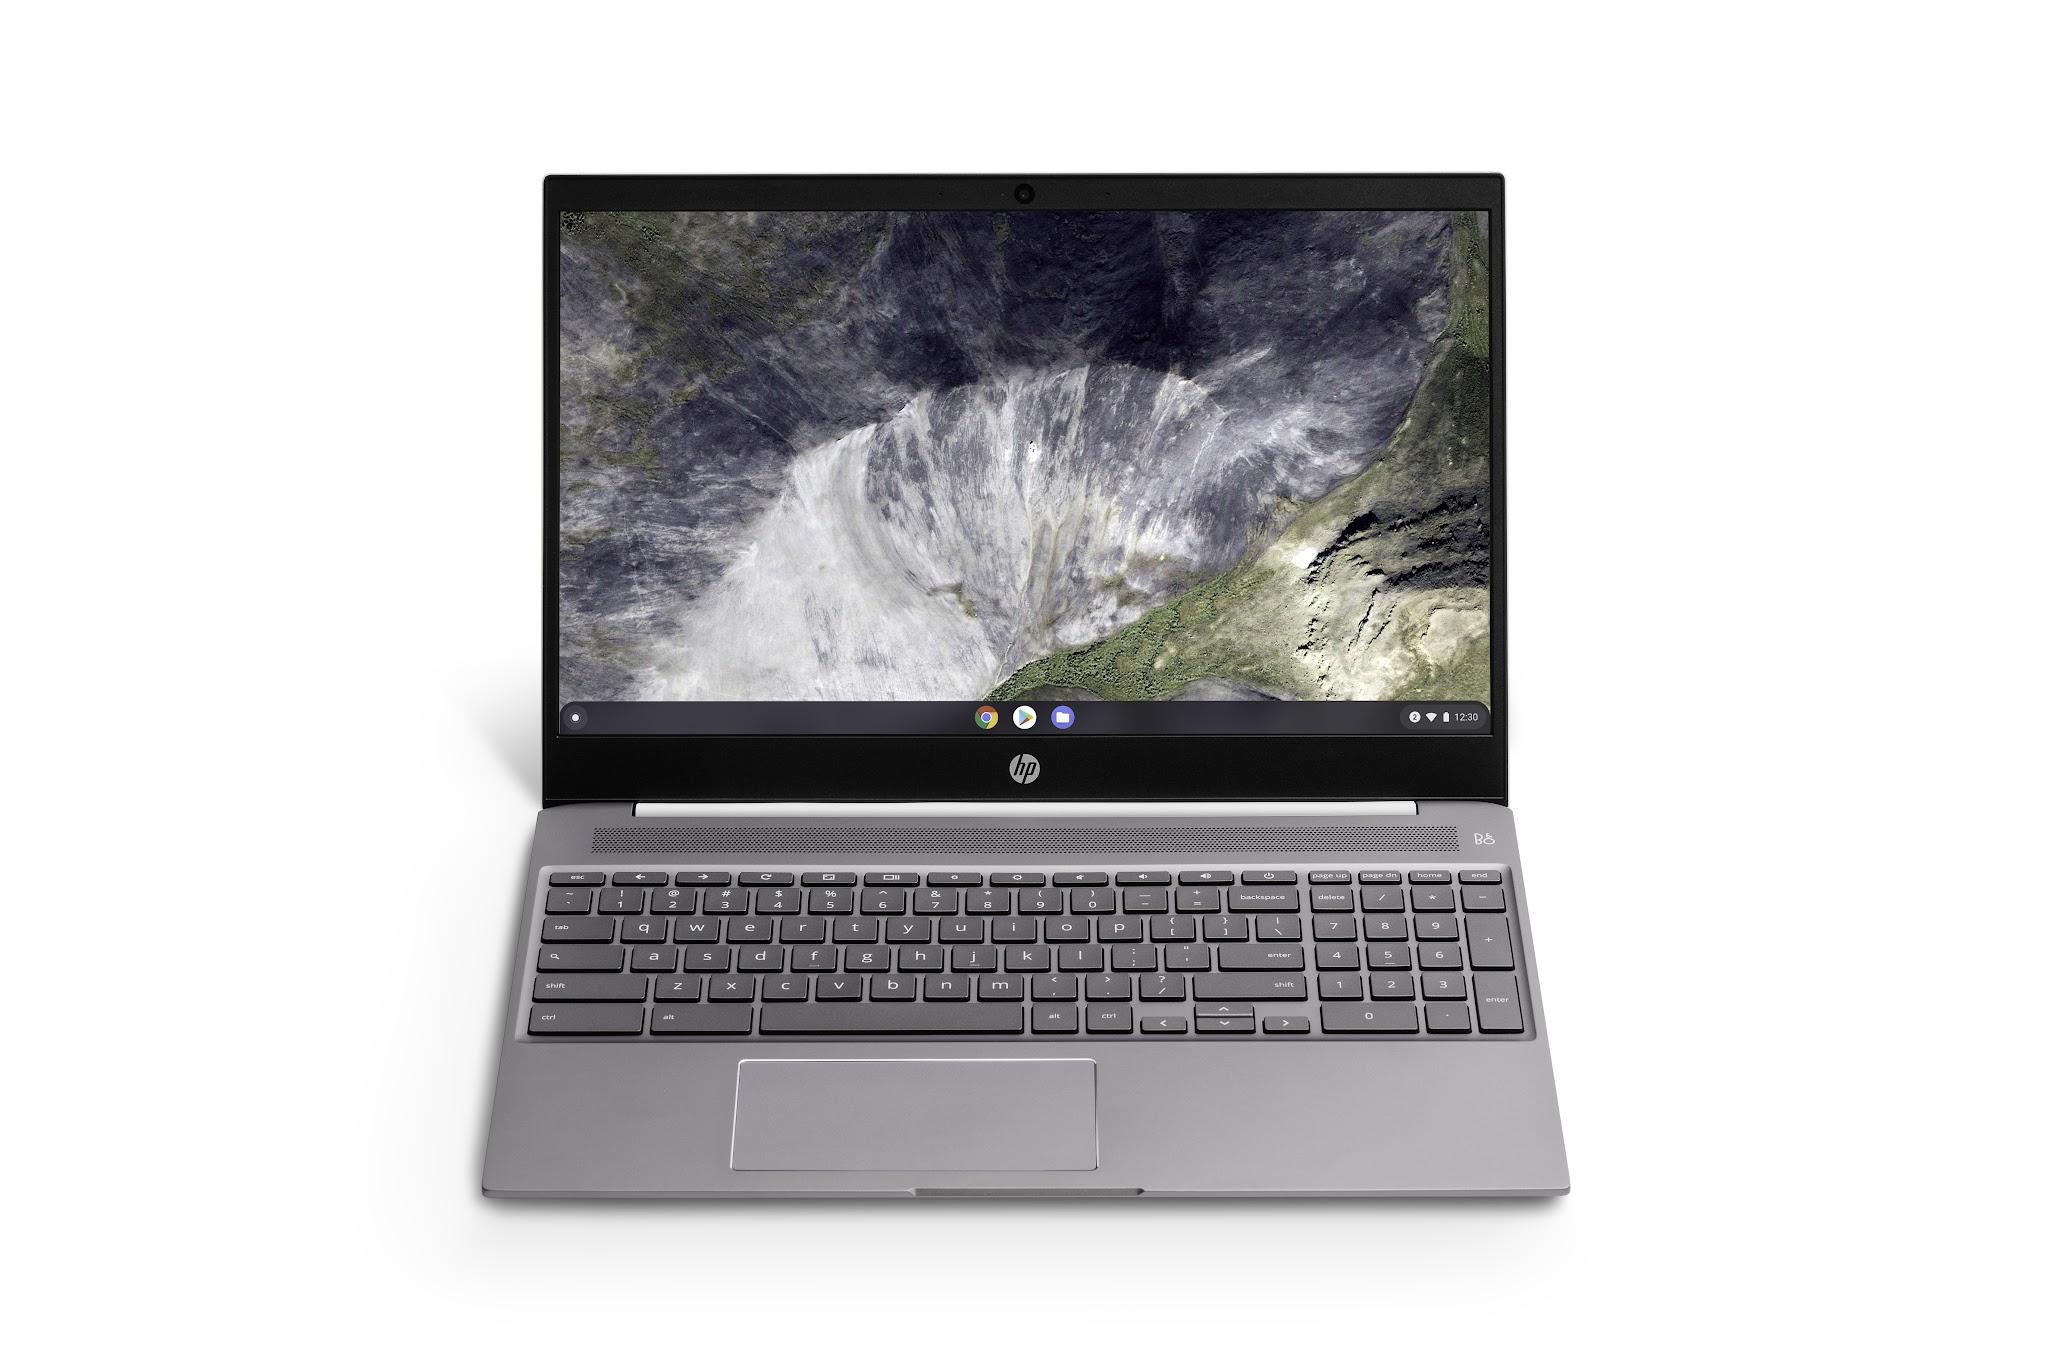 HP Chromebook 15 - photo 2